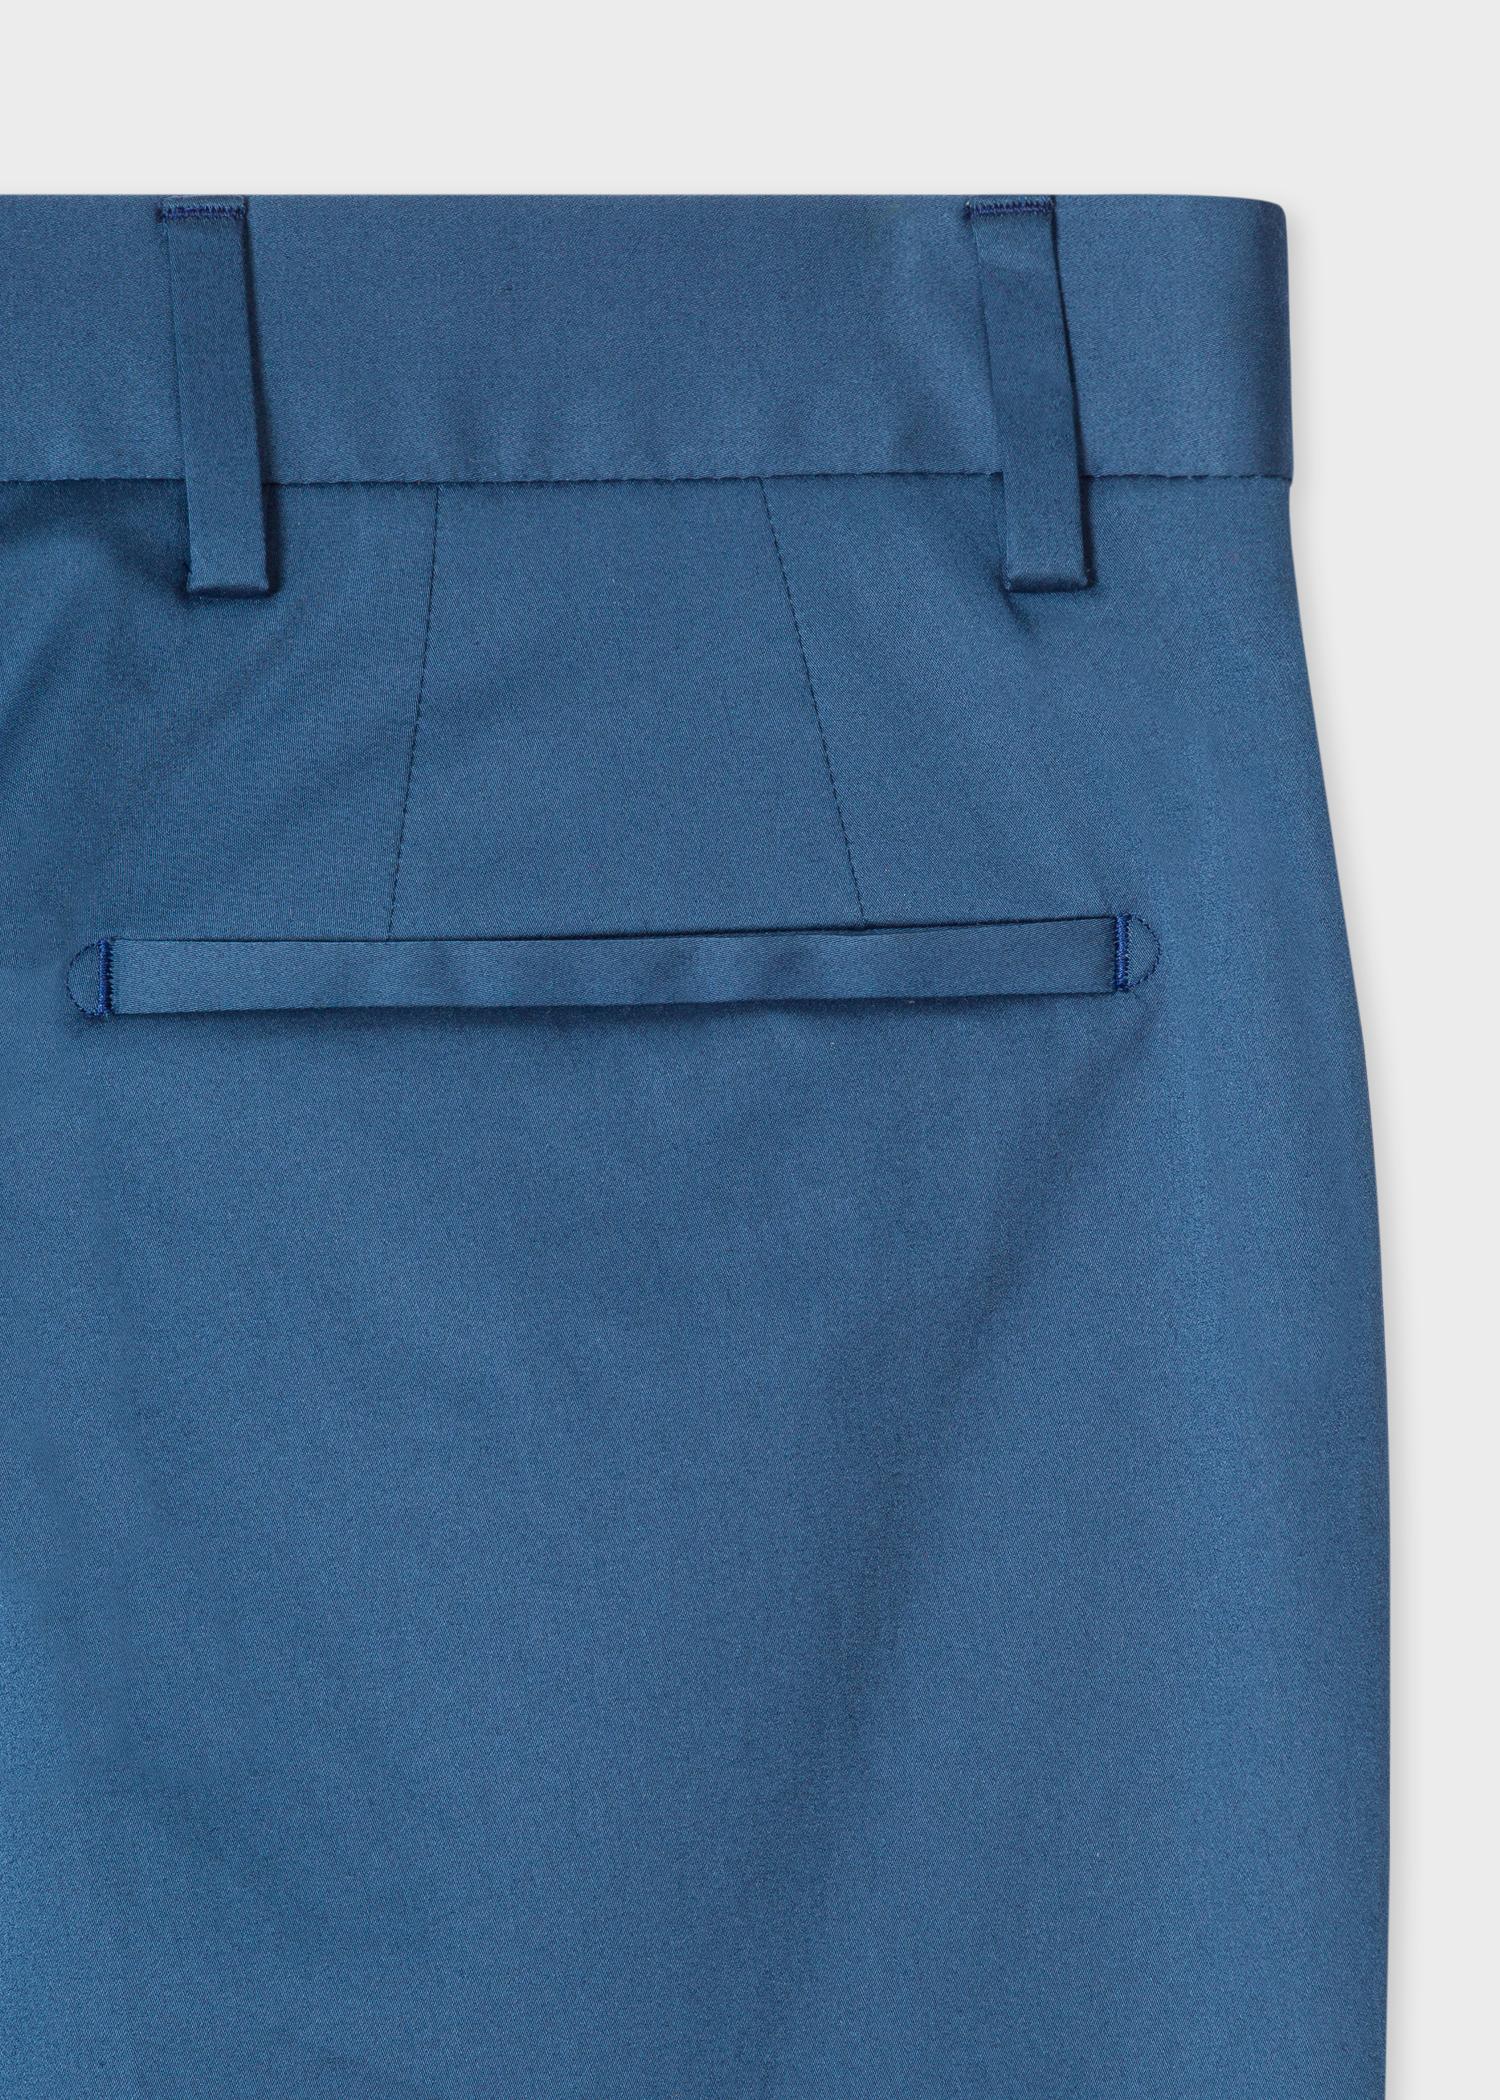 cadafa8f24 Men's Slim-Fit Cobalt Blue Stretch-Cotton Trousers